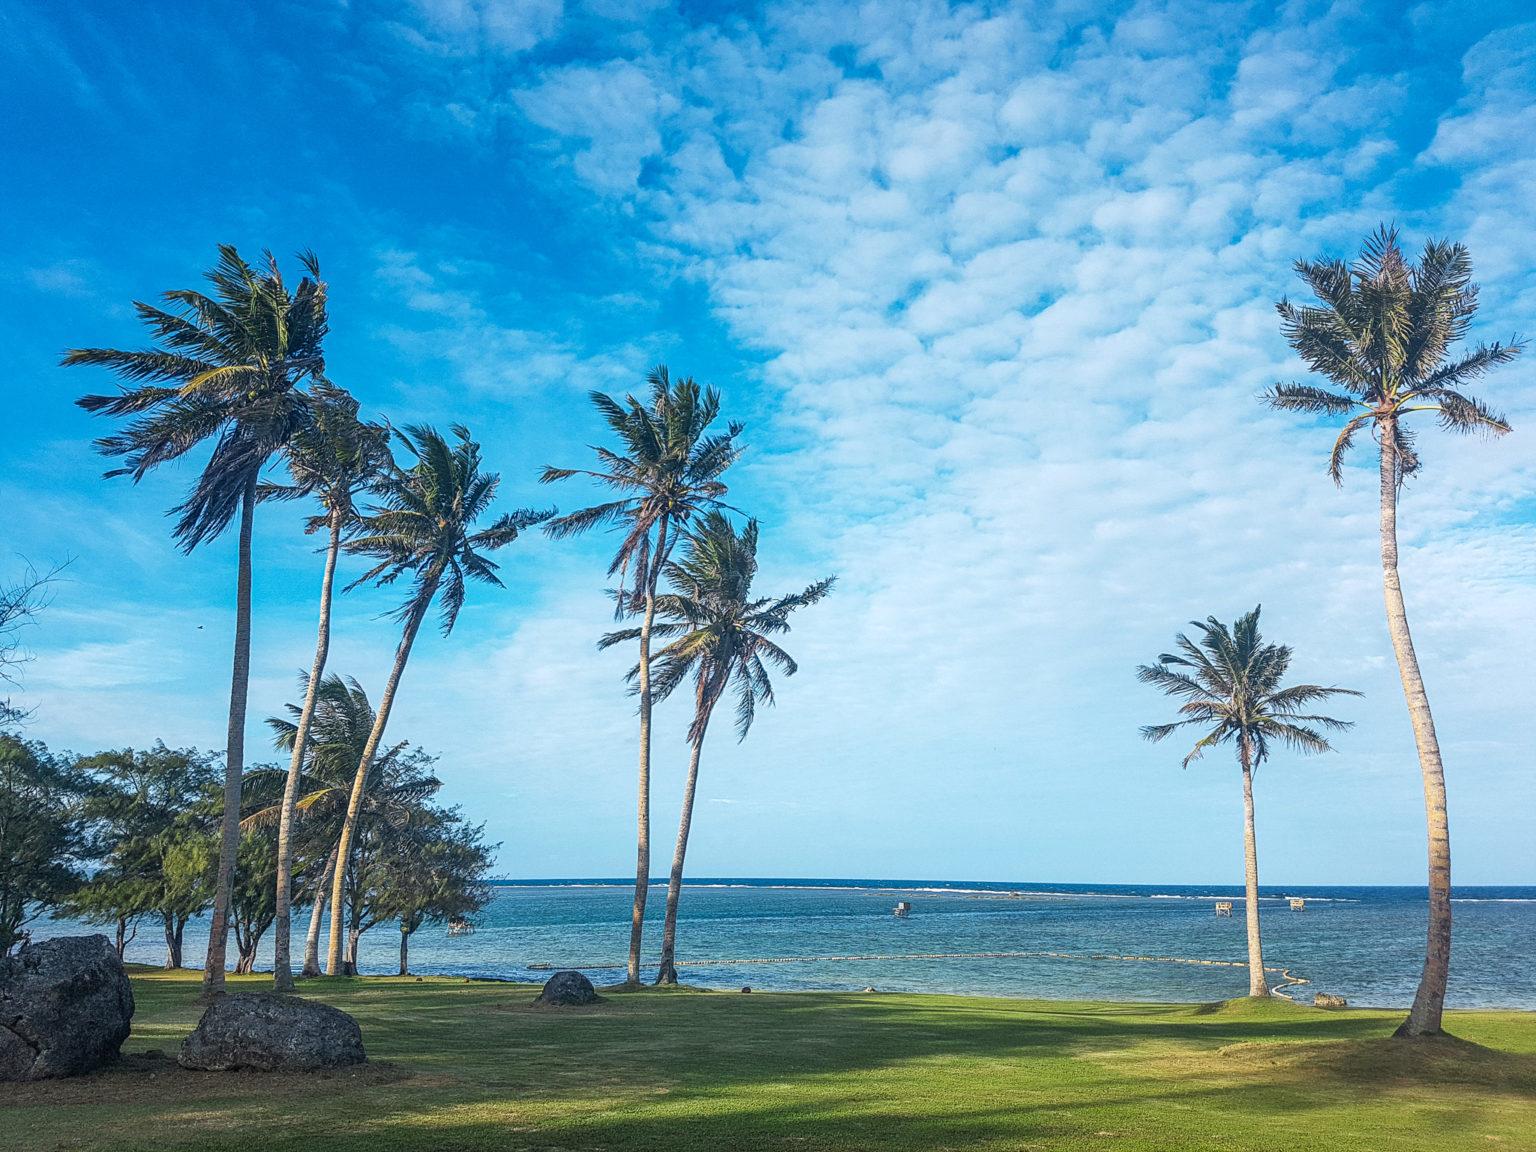 Visiting Guam - Jeff's Pirates Cove